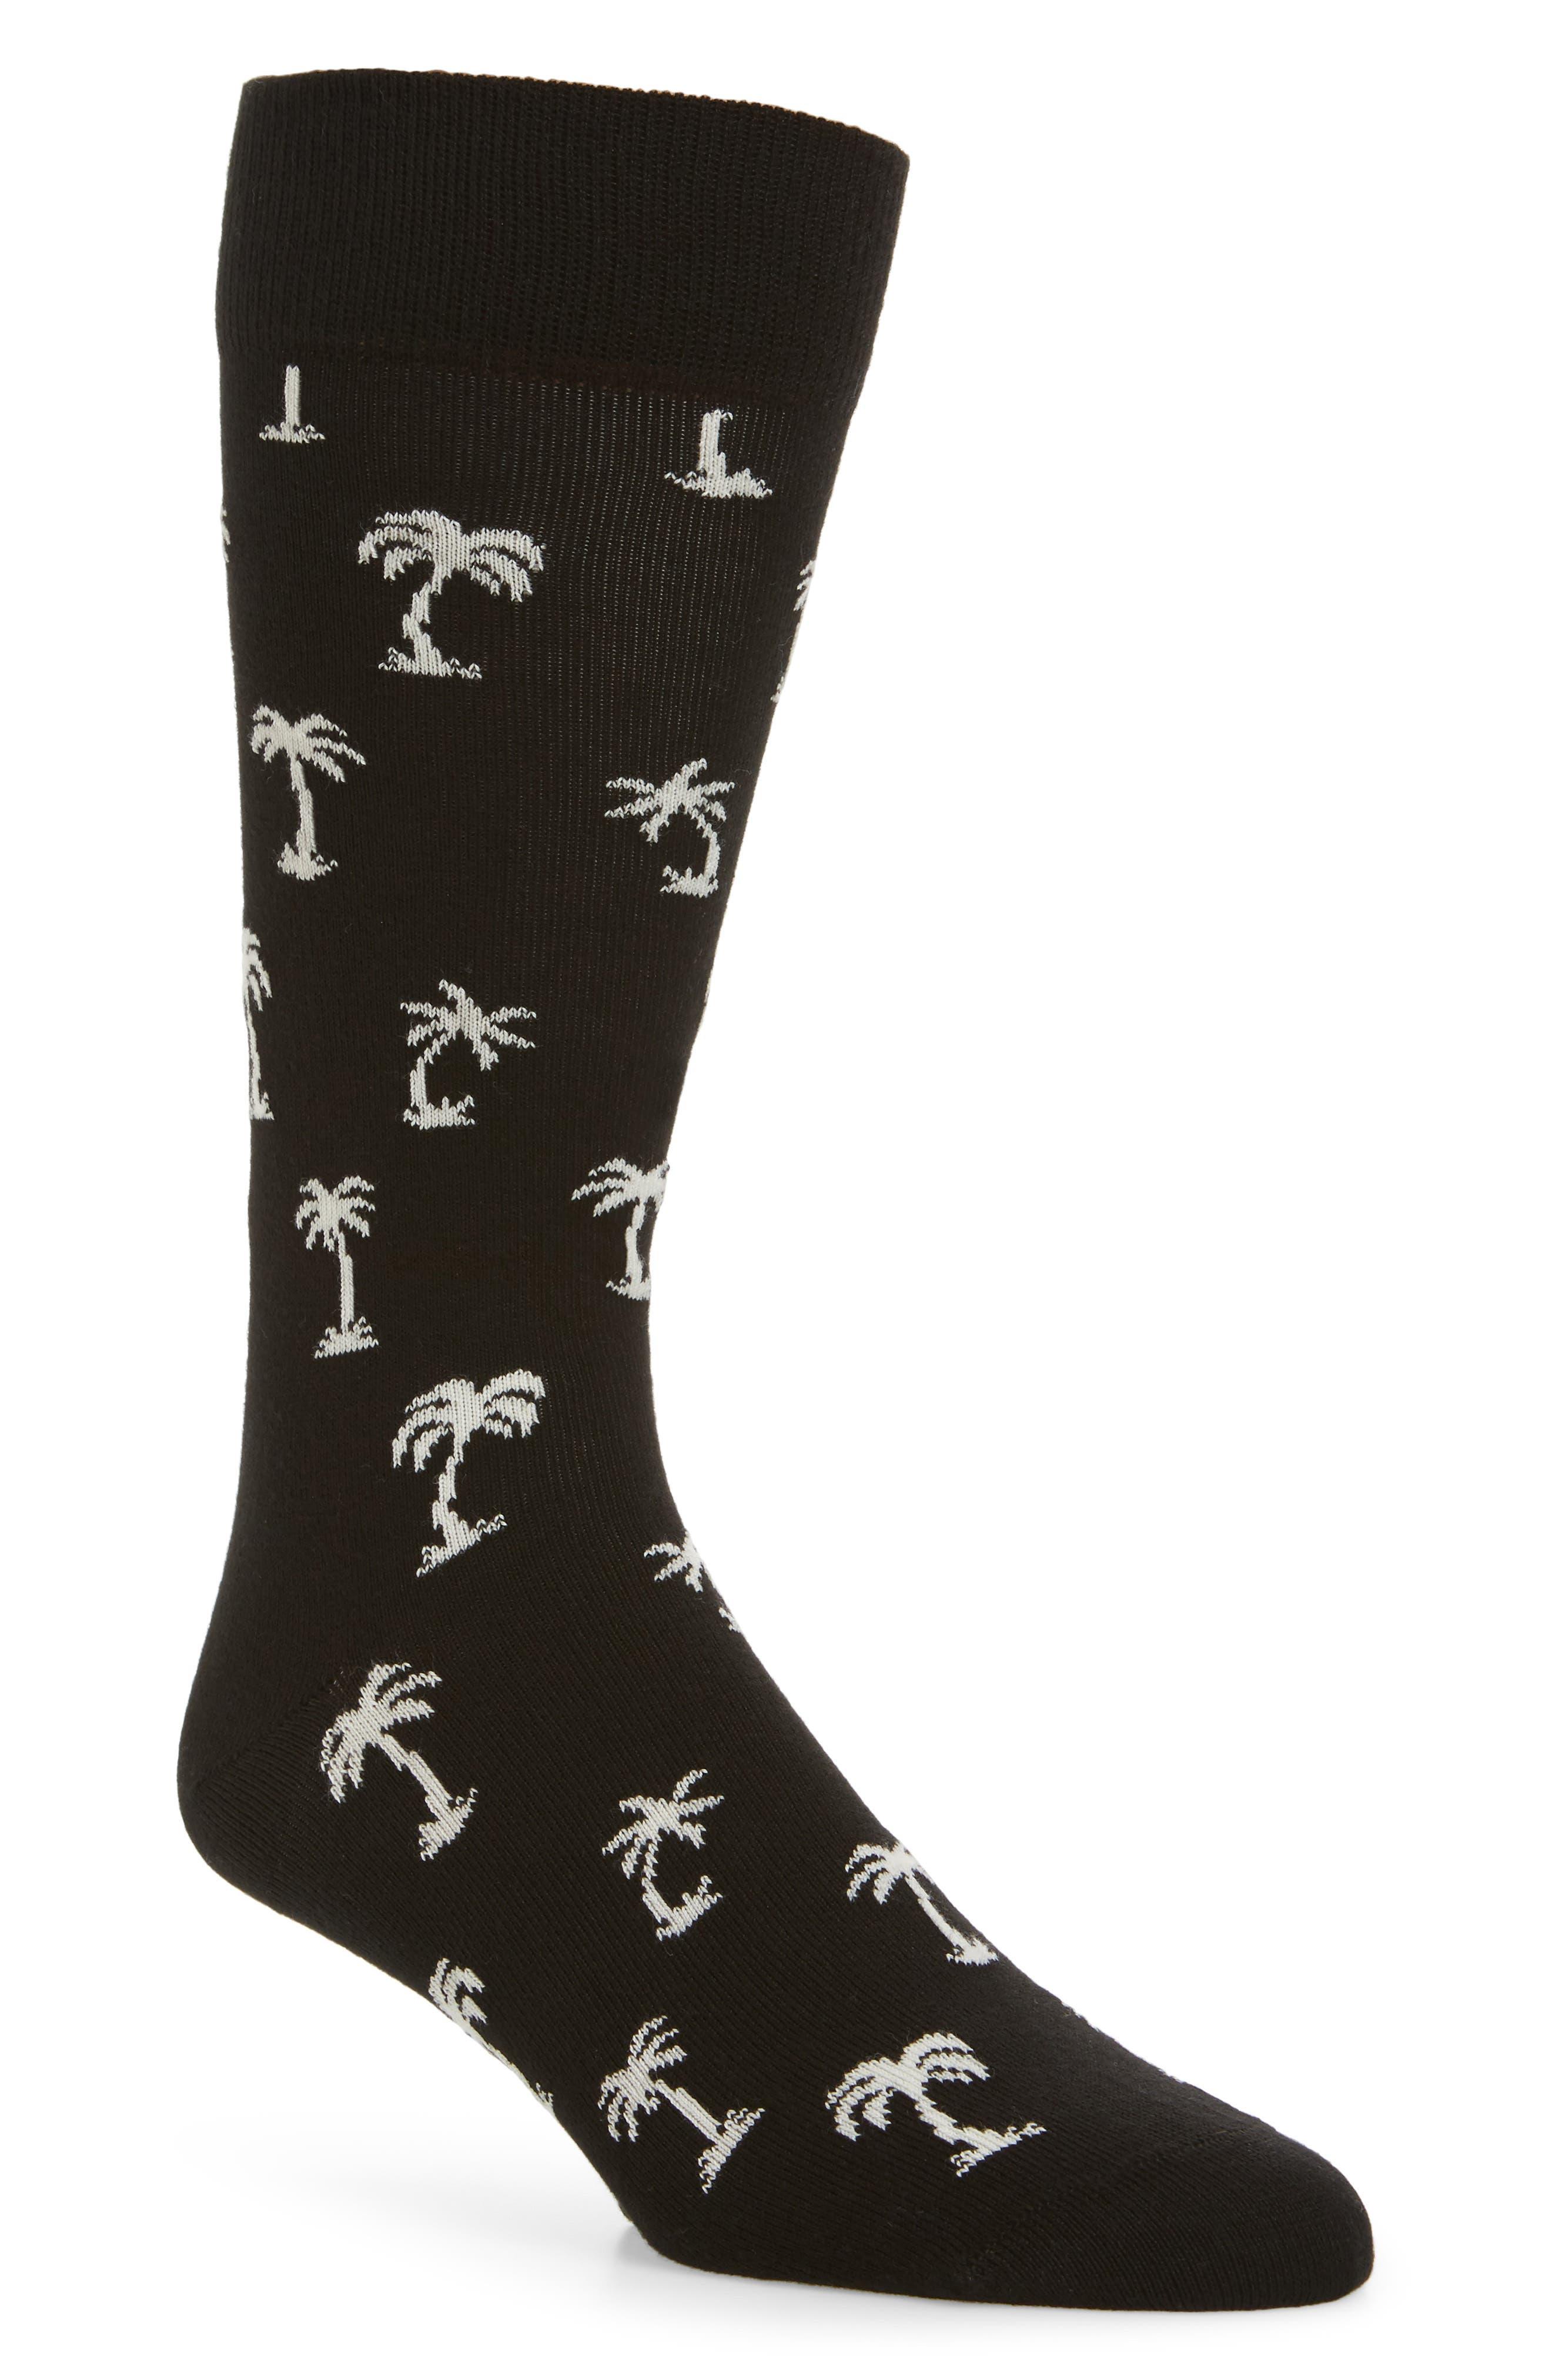 Palm Beach Crew Socks,                         Main,                         color, Black/ White